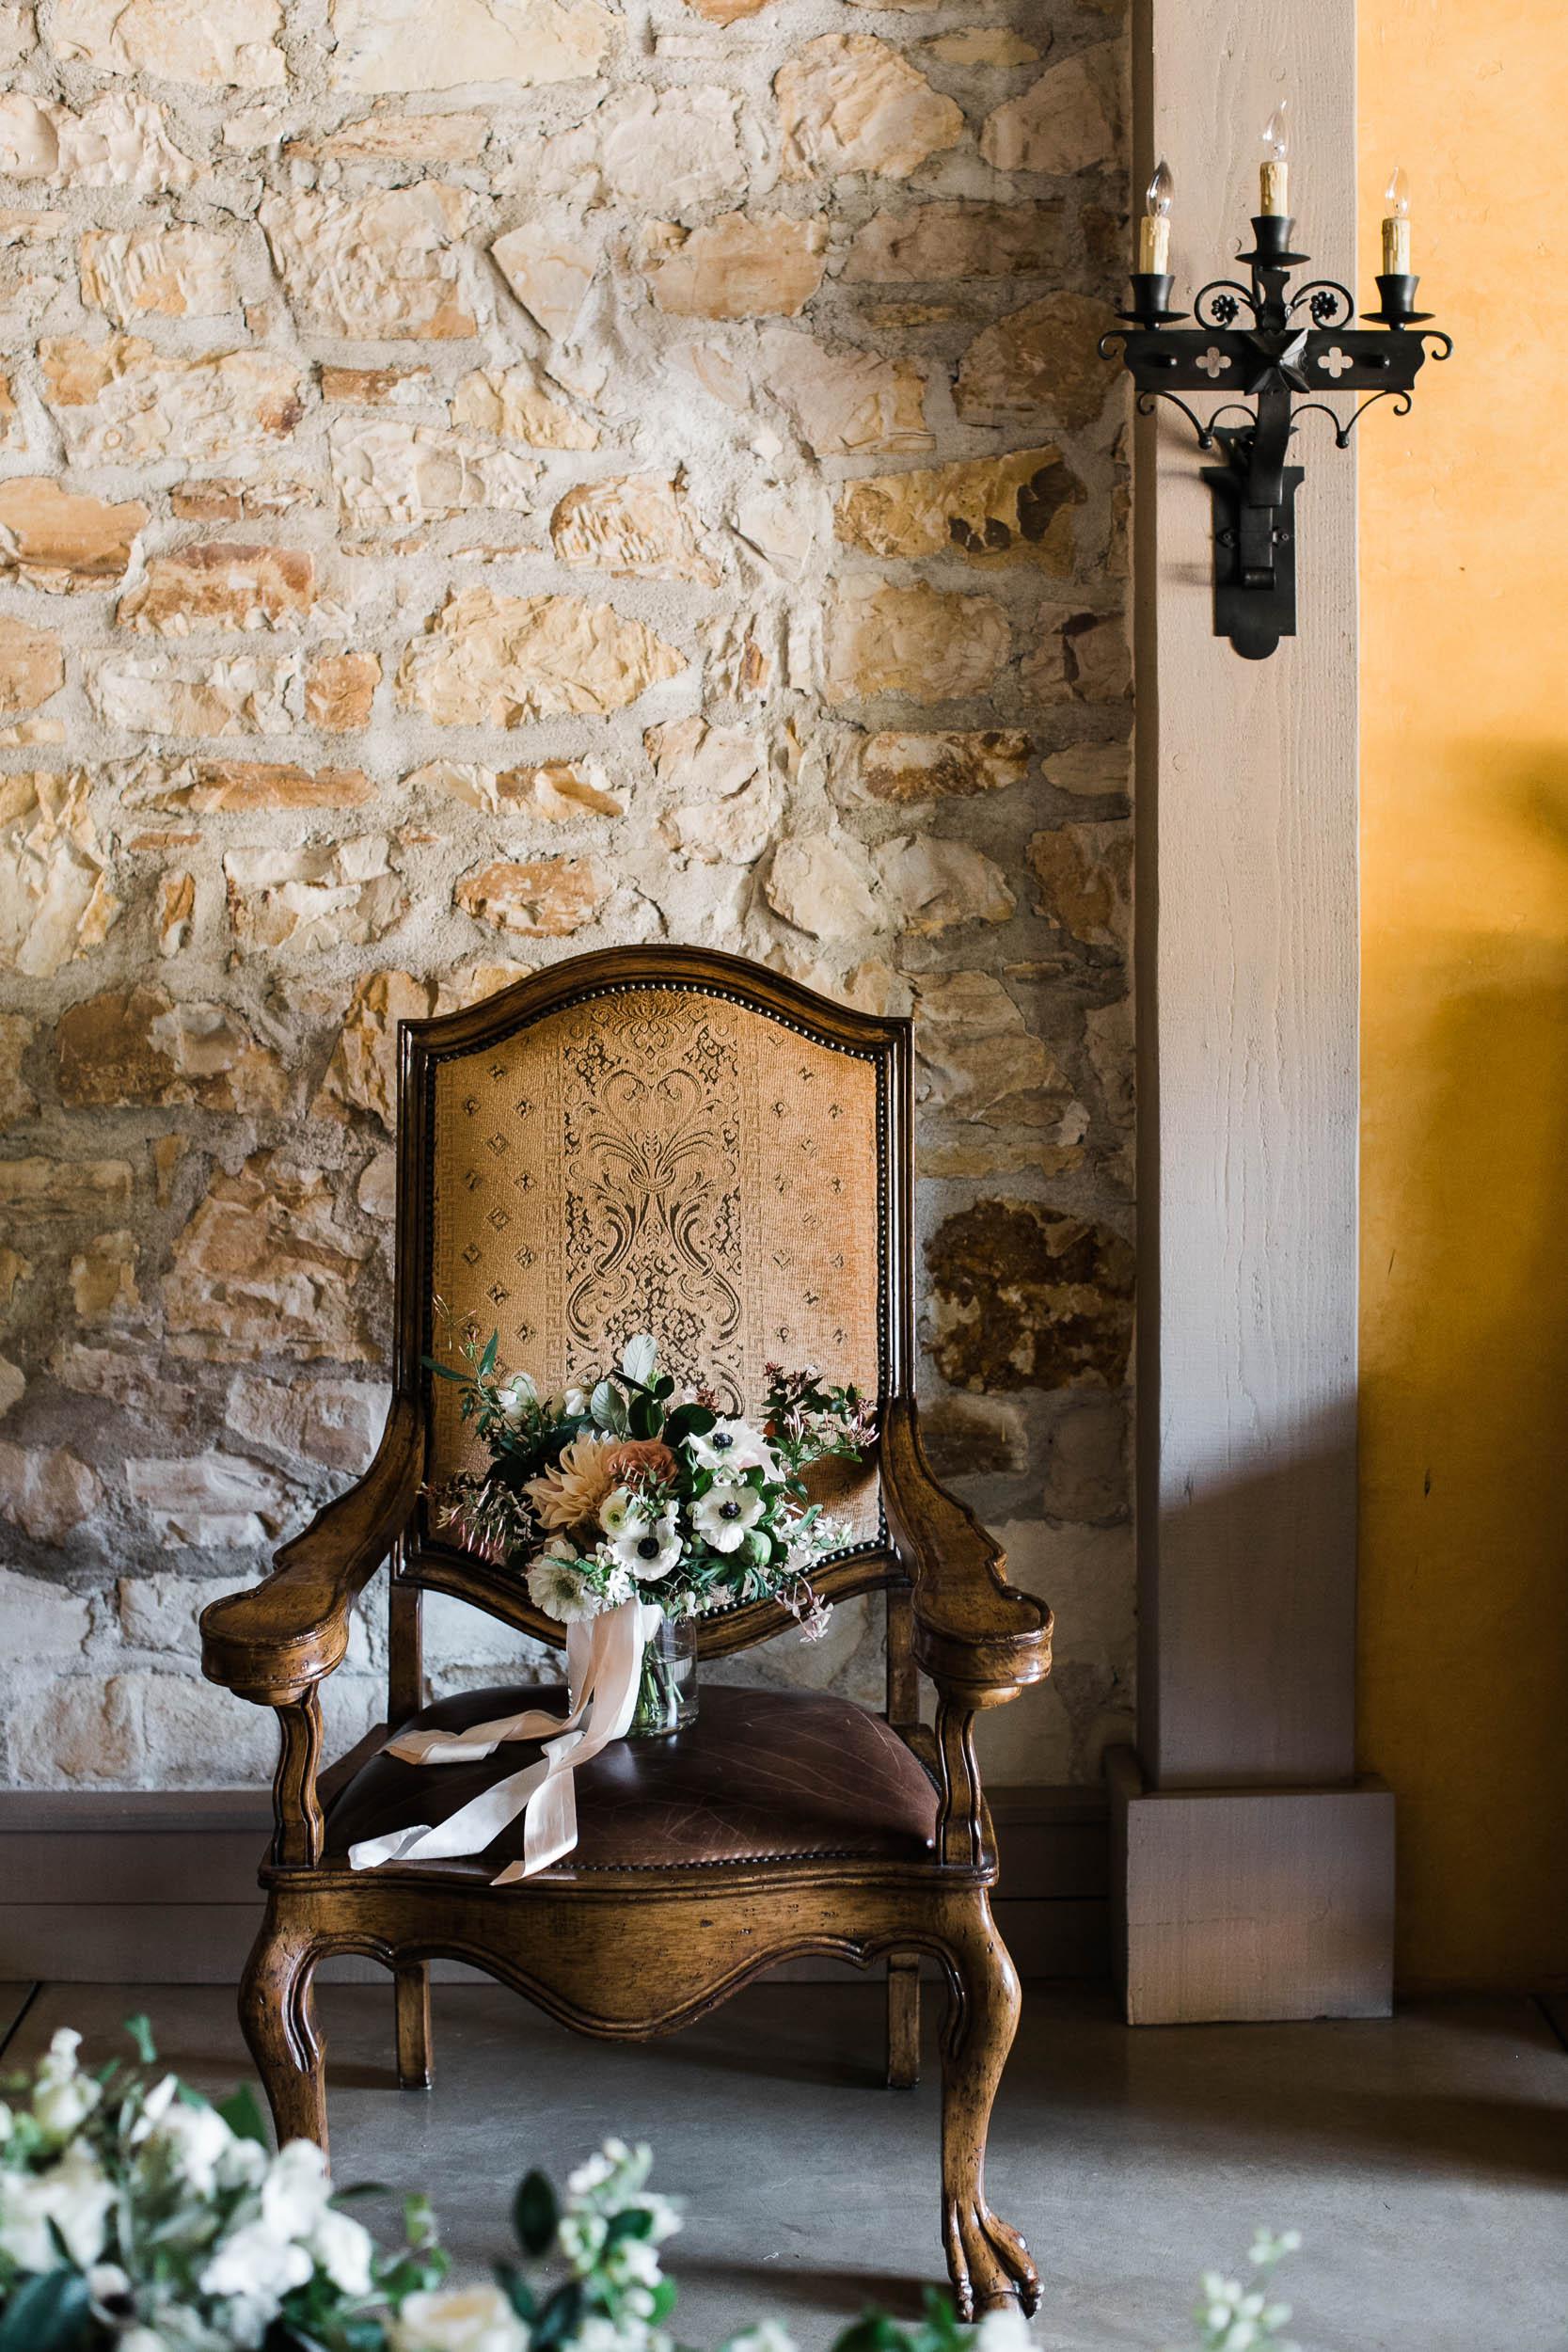 010_072118_D+K_Holman Ranch Wedding_Buena Lane Photography_0041ER copy.jpg